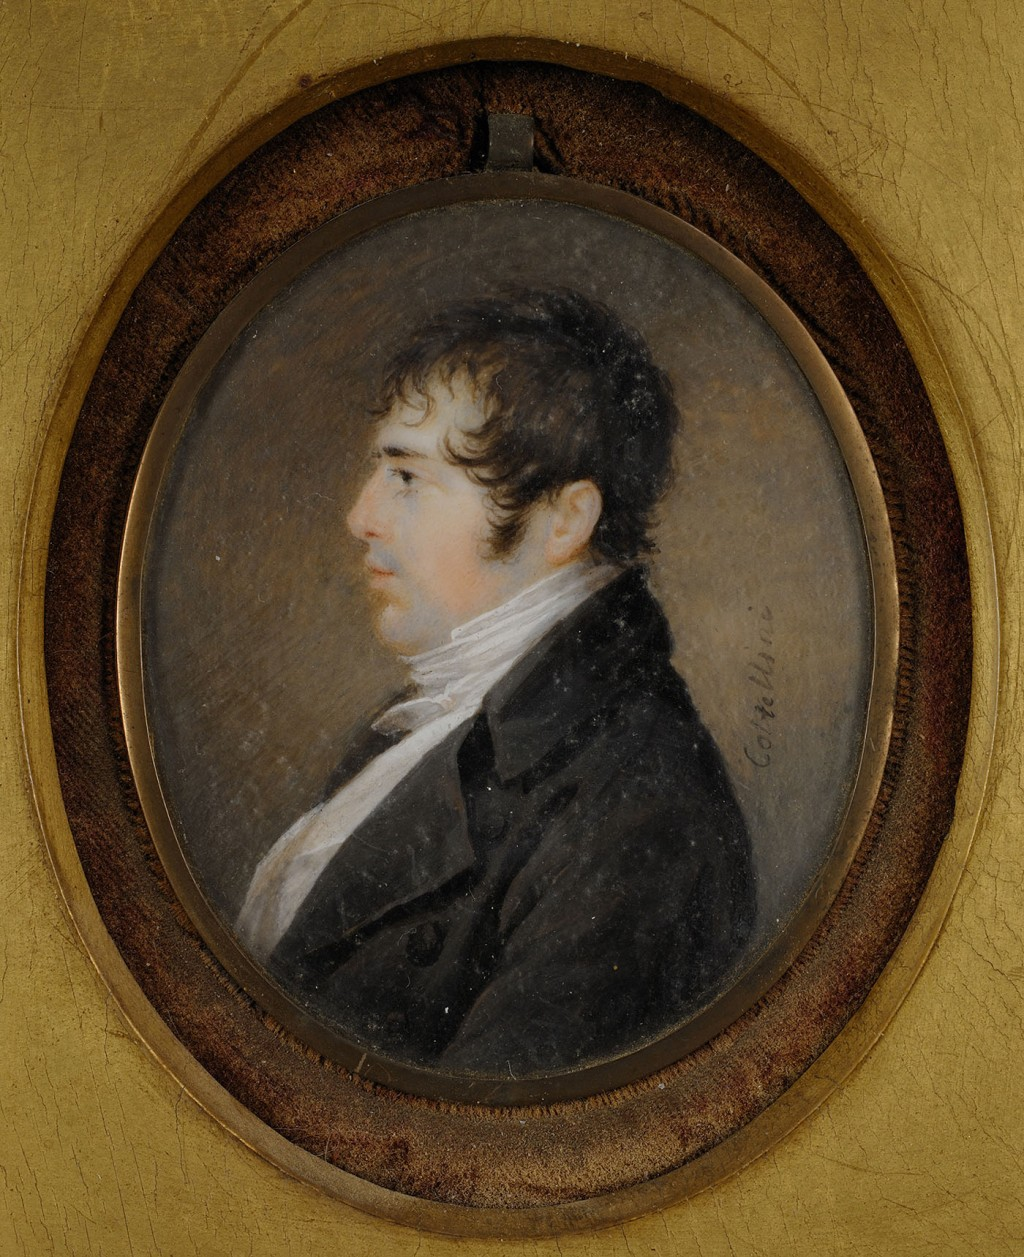 Lot 39: Constantina Coltellini, portrait of Richard Seton